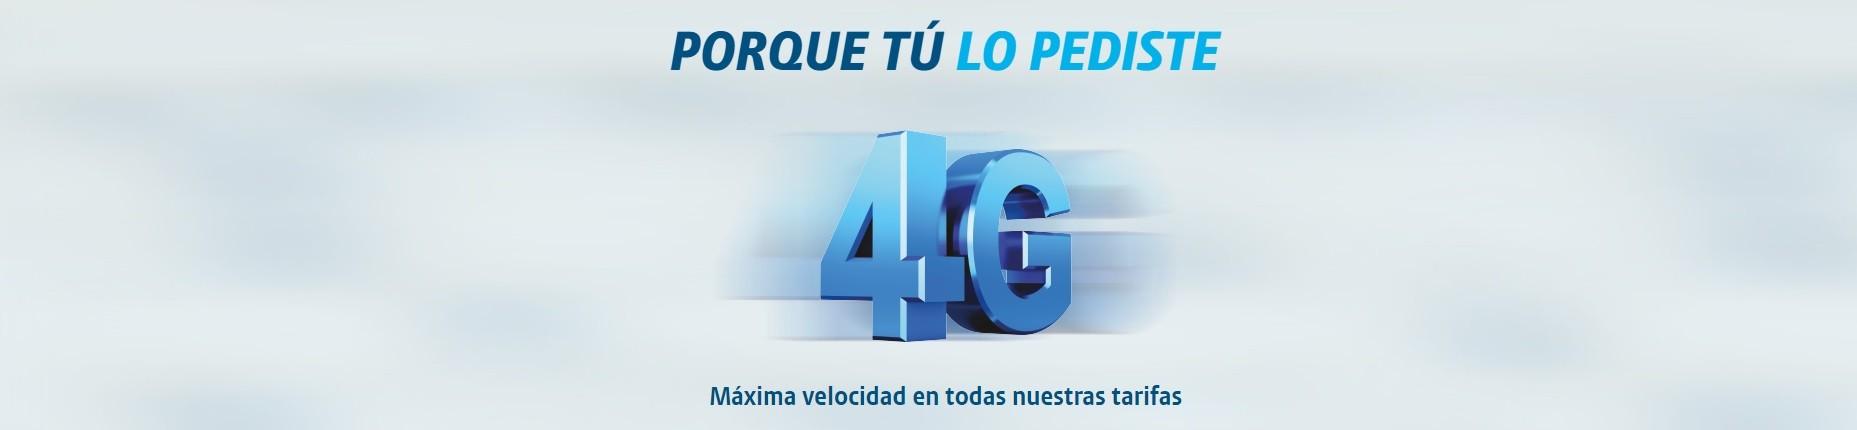 Digimobil ya dispone de 4G